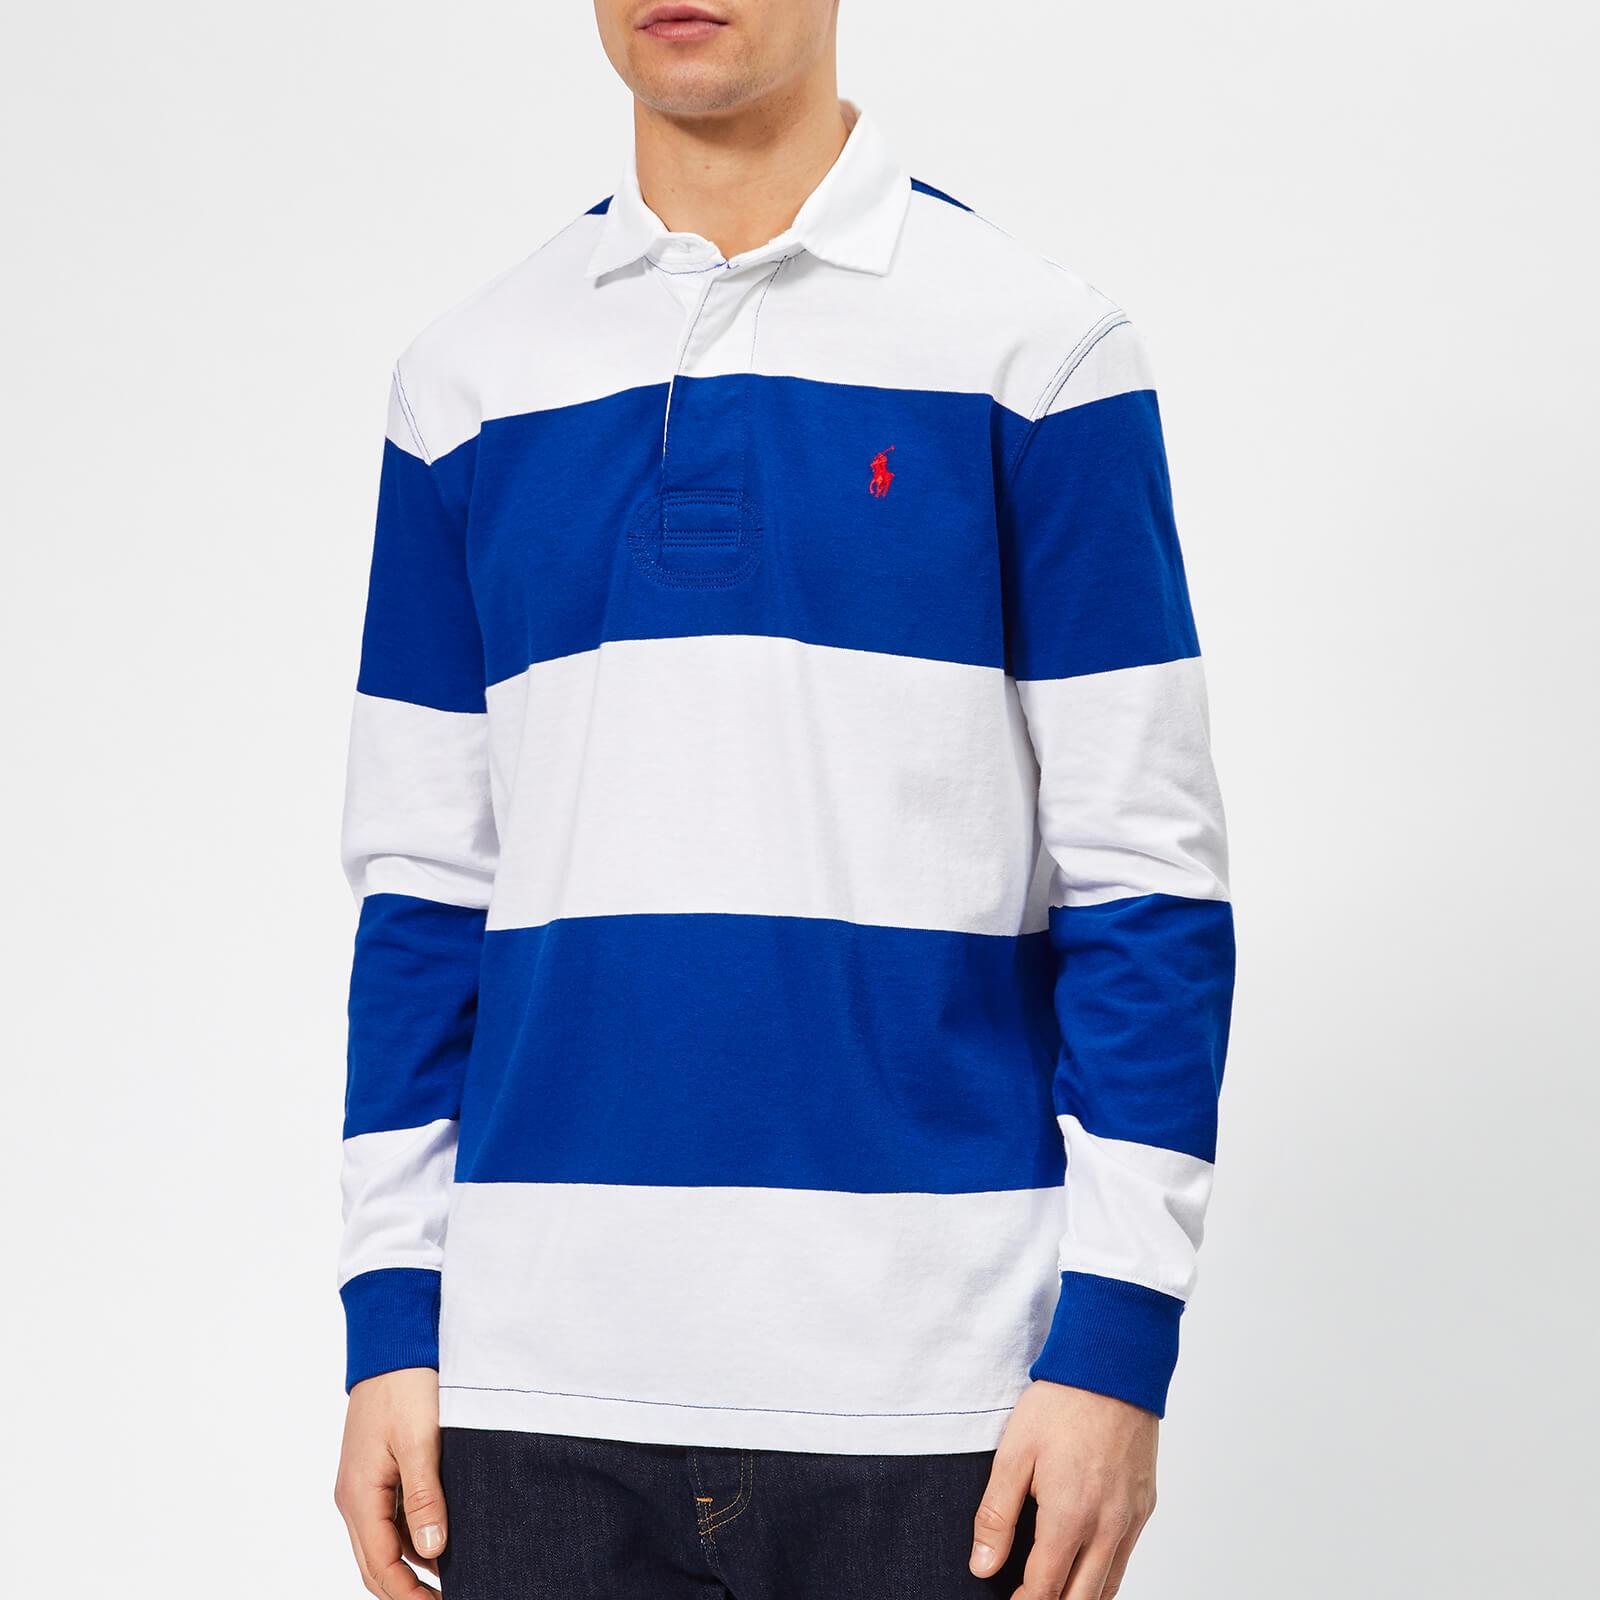 Lauren Stripe Polo Rugby Men's Starclassic Oxford Shirt Sapphire Ralph dBoQErWCxe